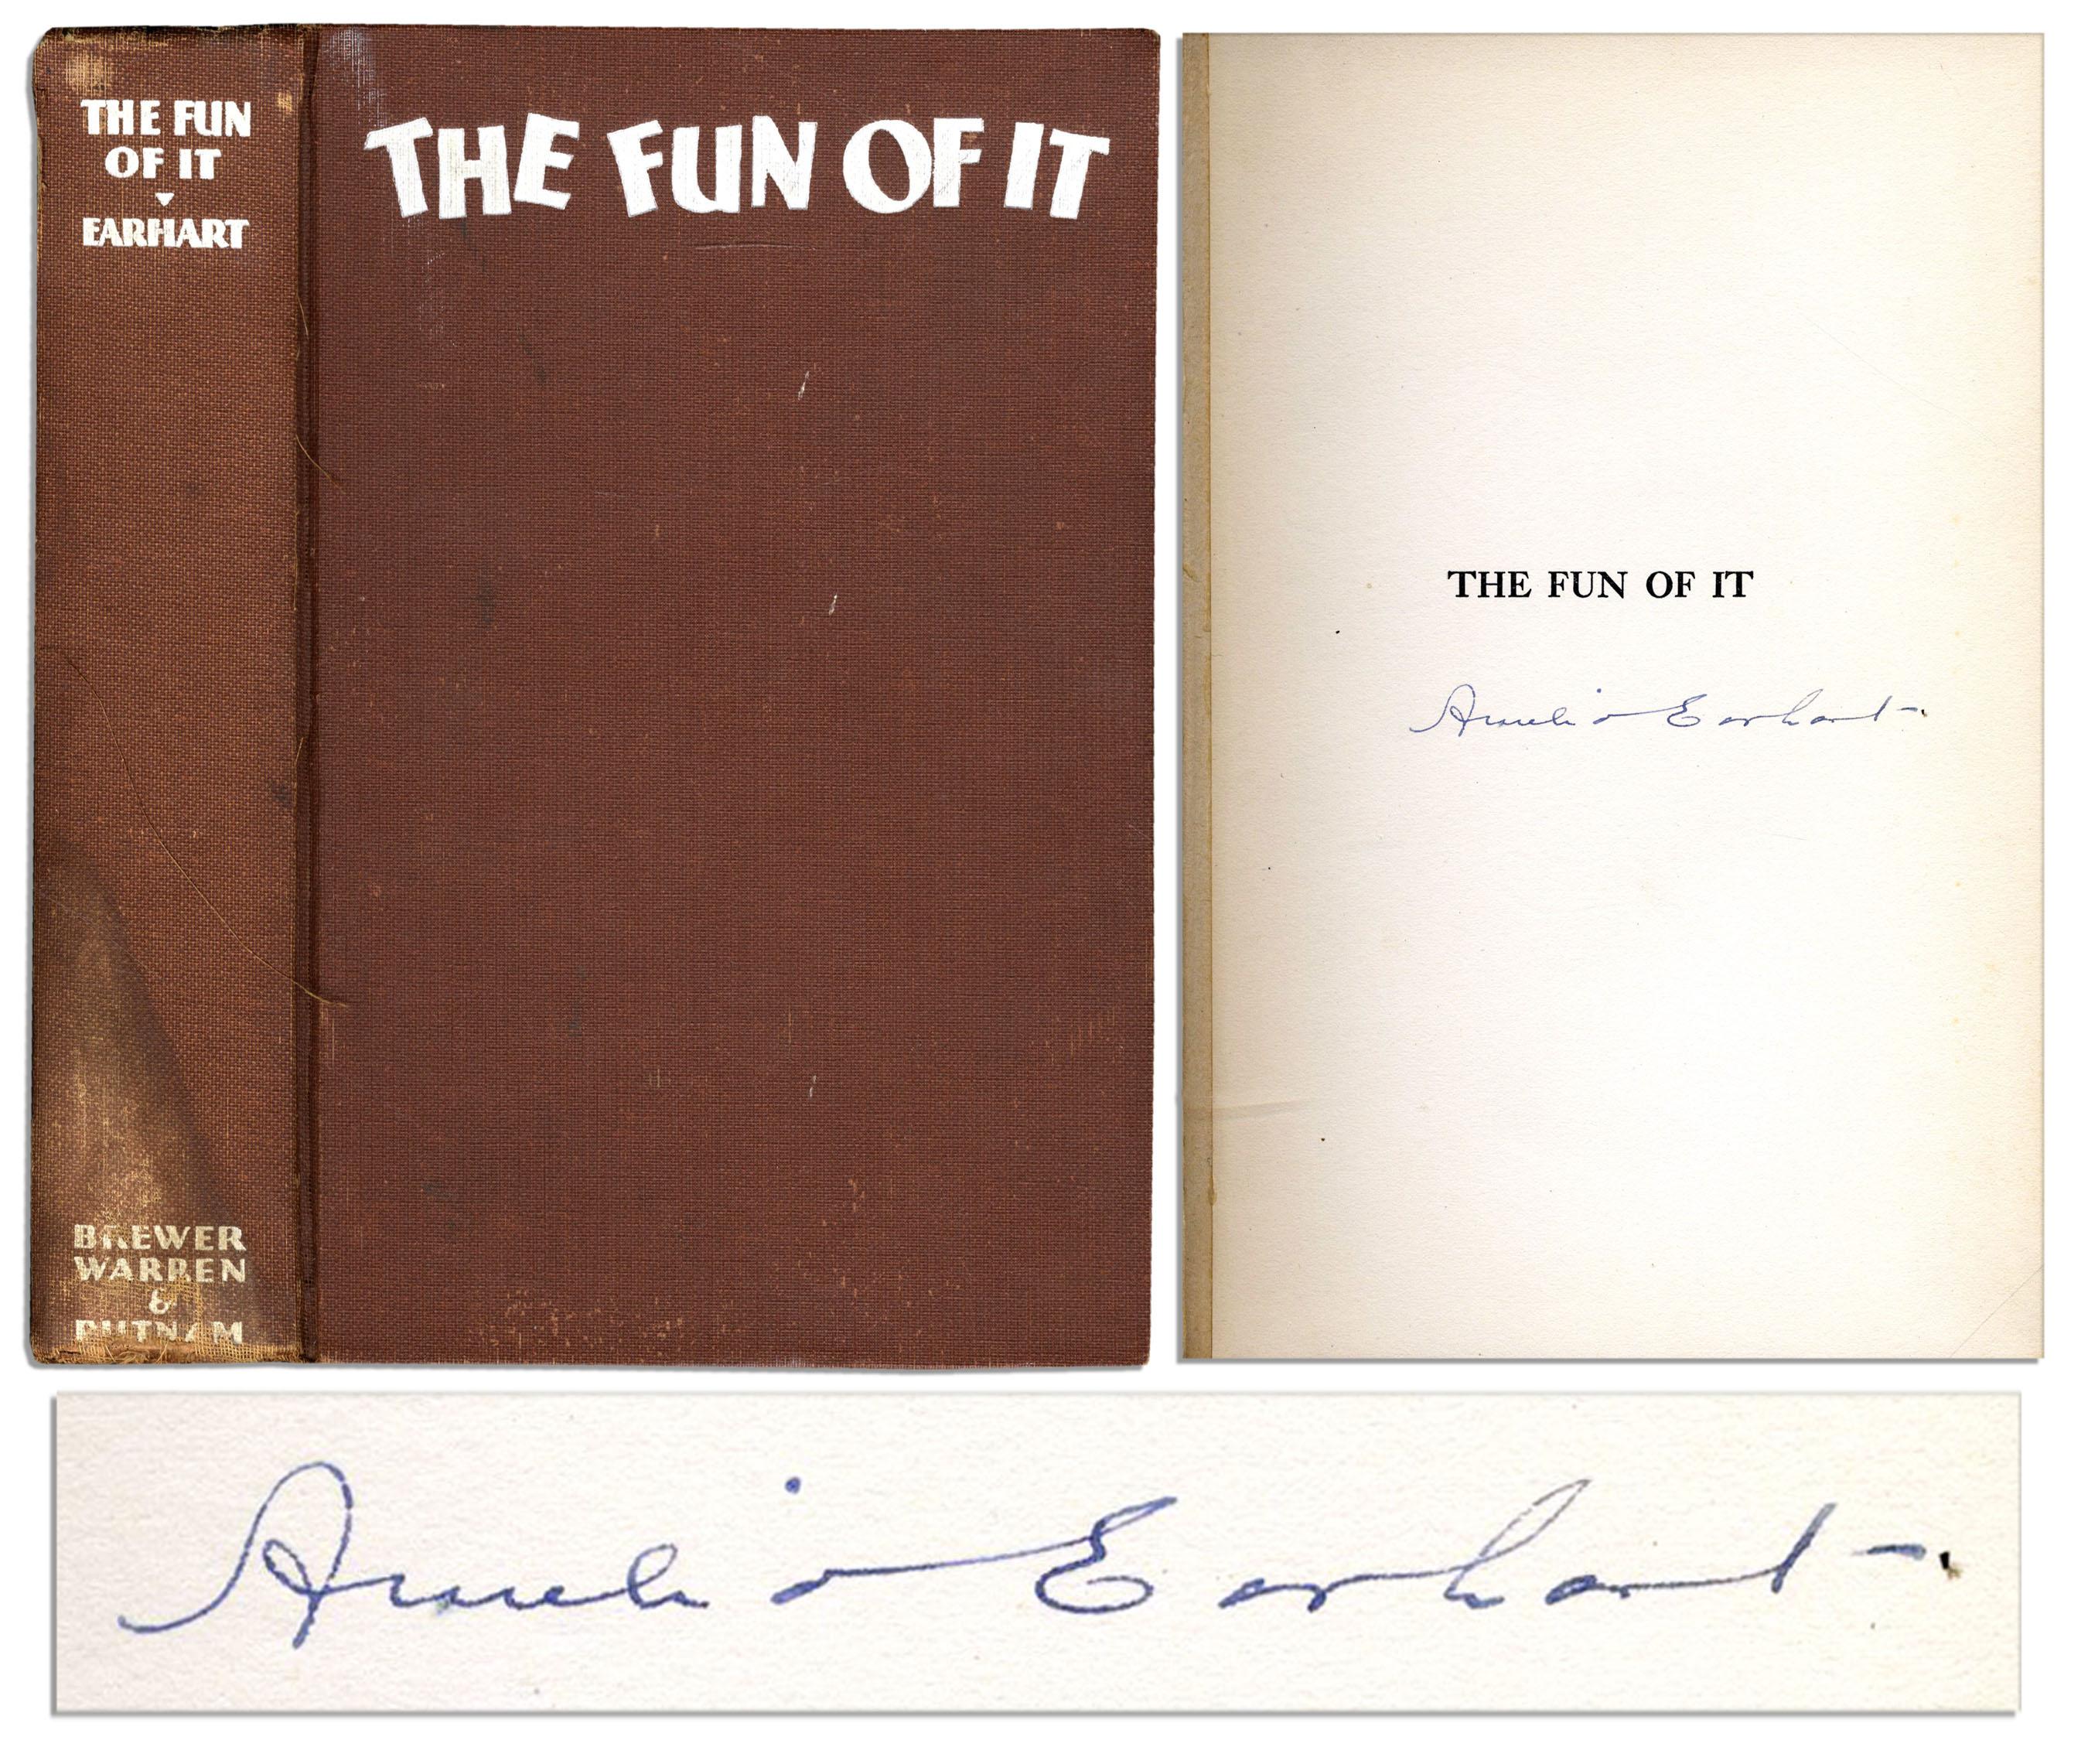 Amelia Earhart Fun of It signed